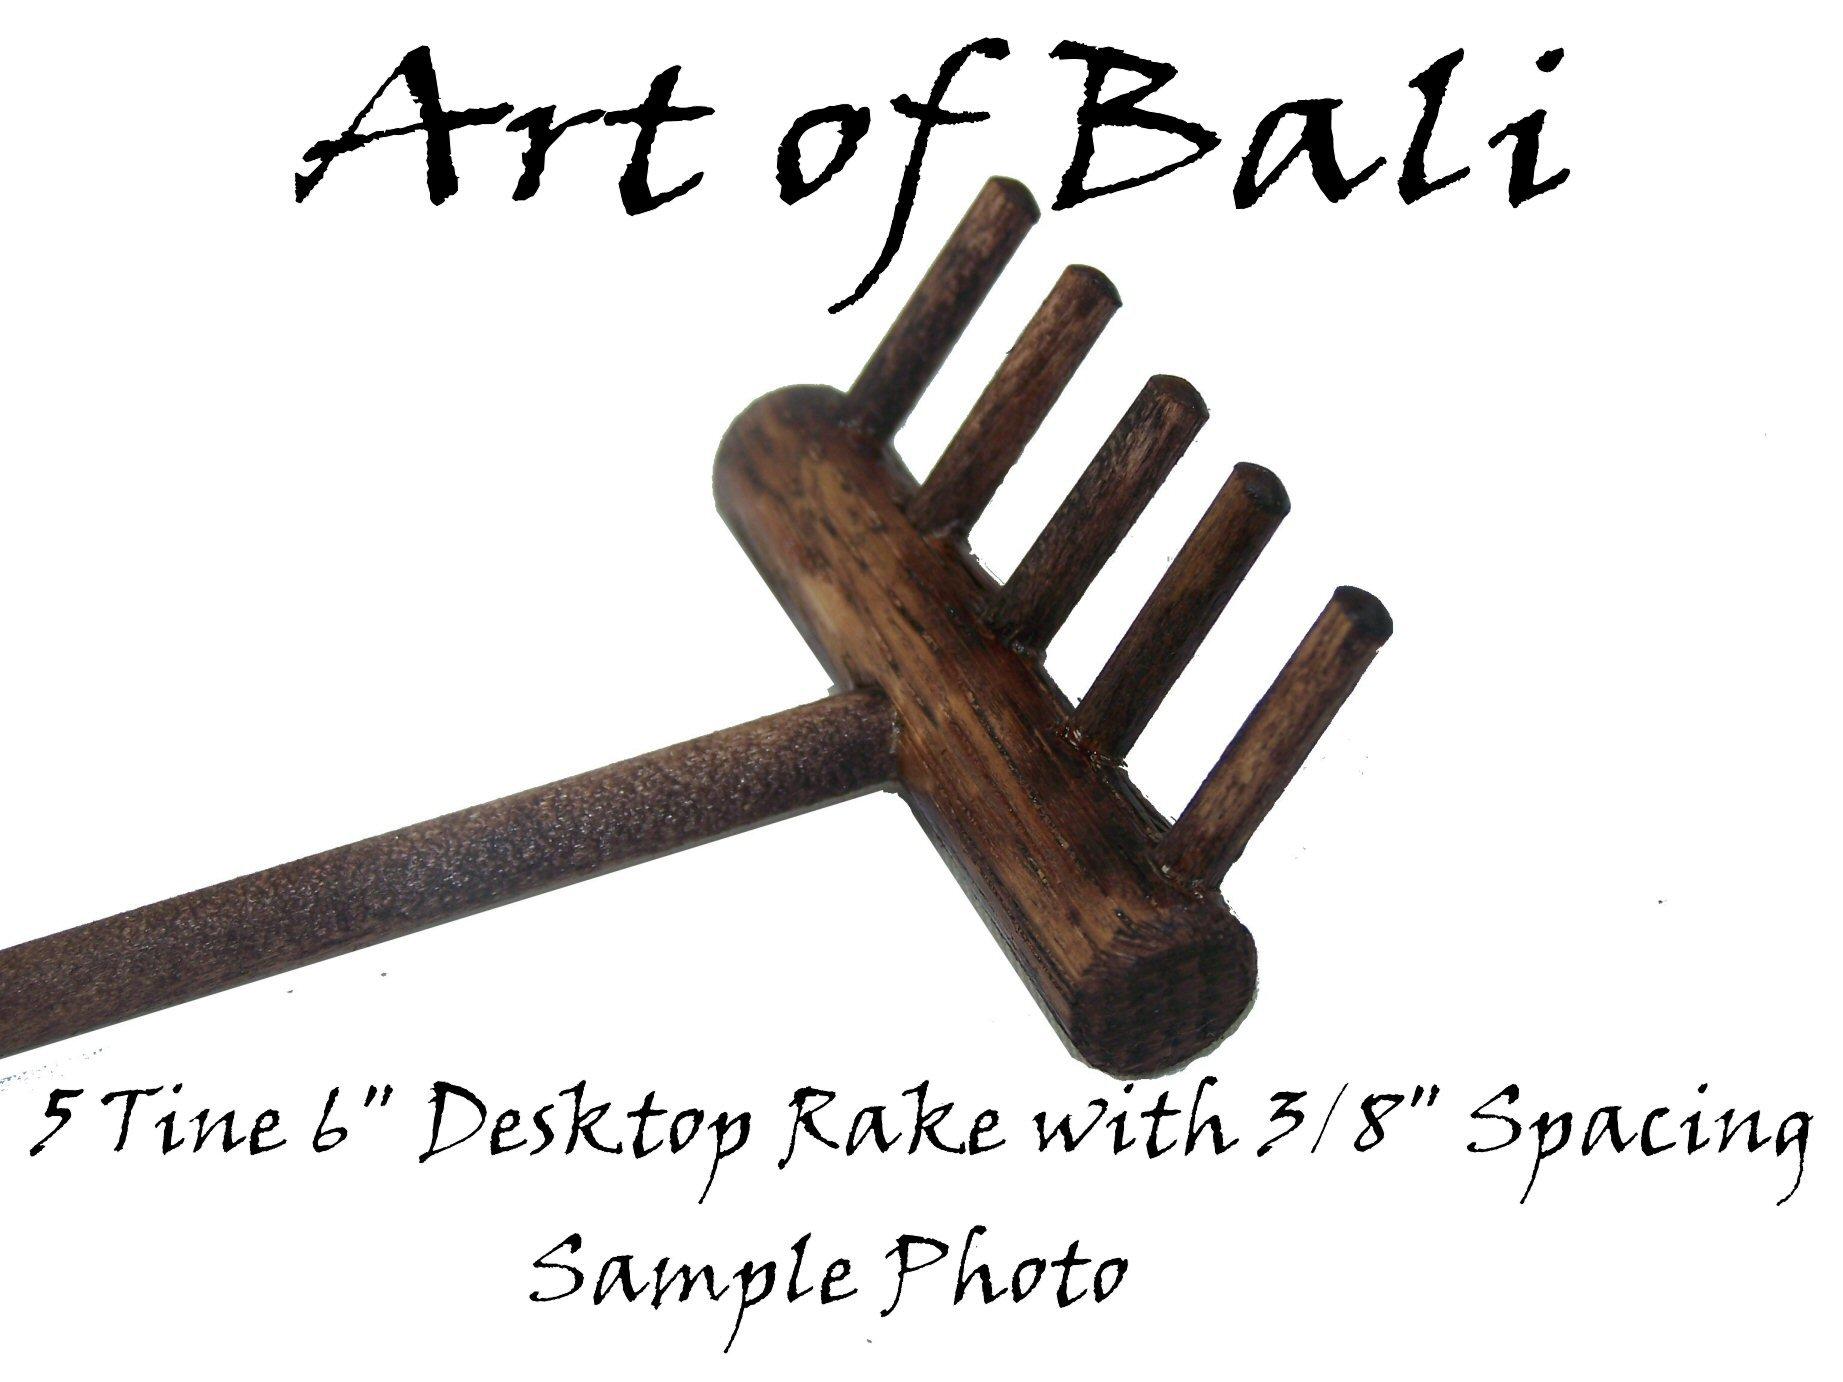 Art of Bali Zen Garden Rake Five Tine Desktop Rake - Zen Gardens